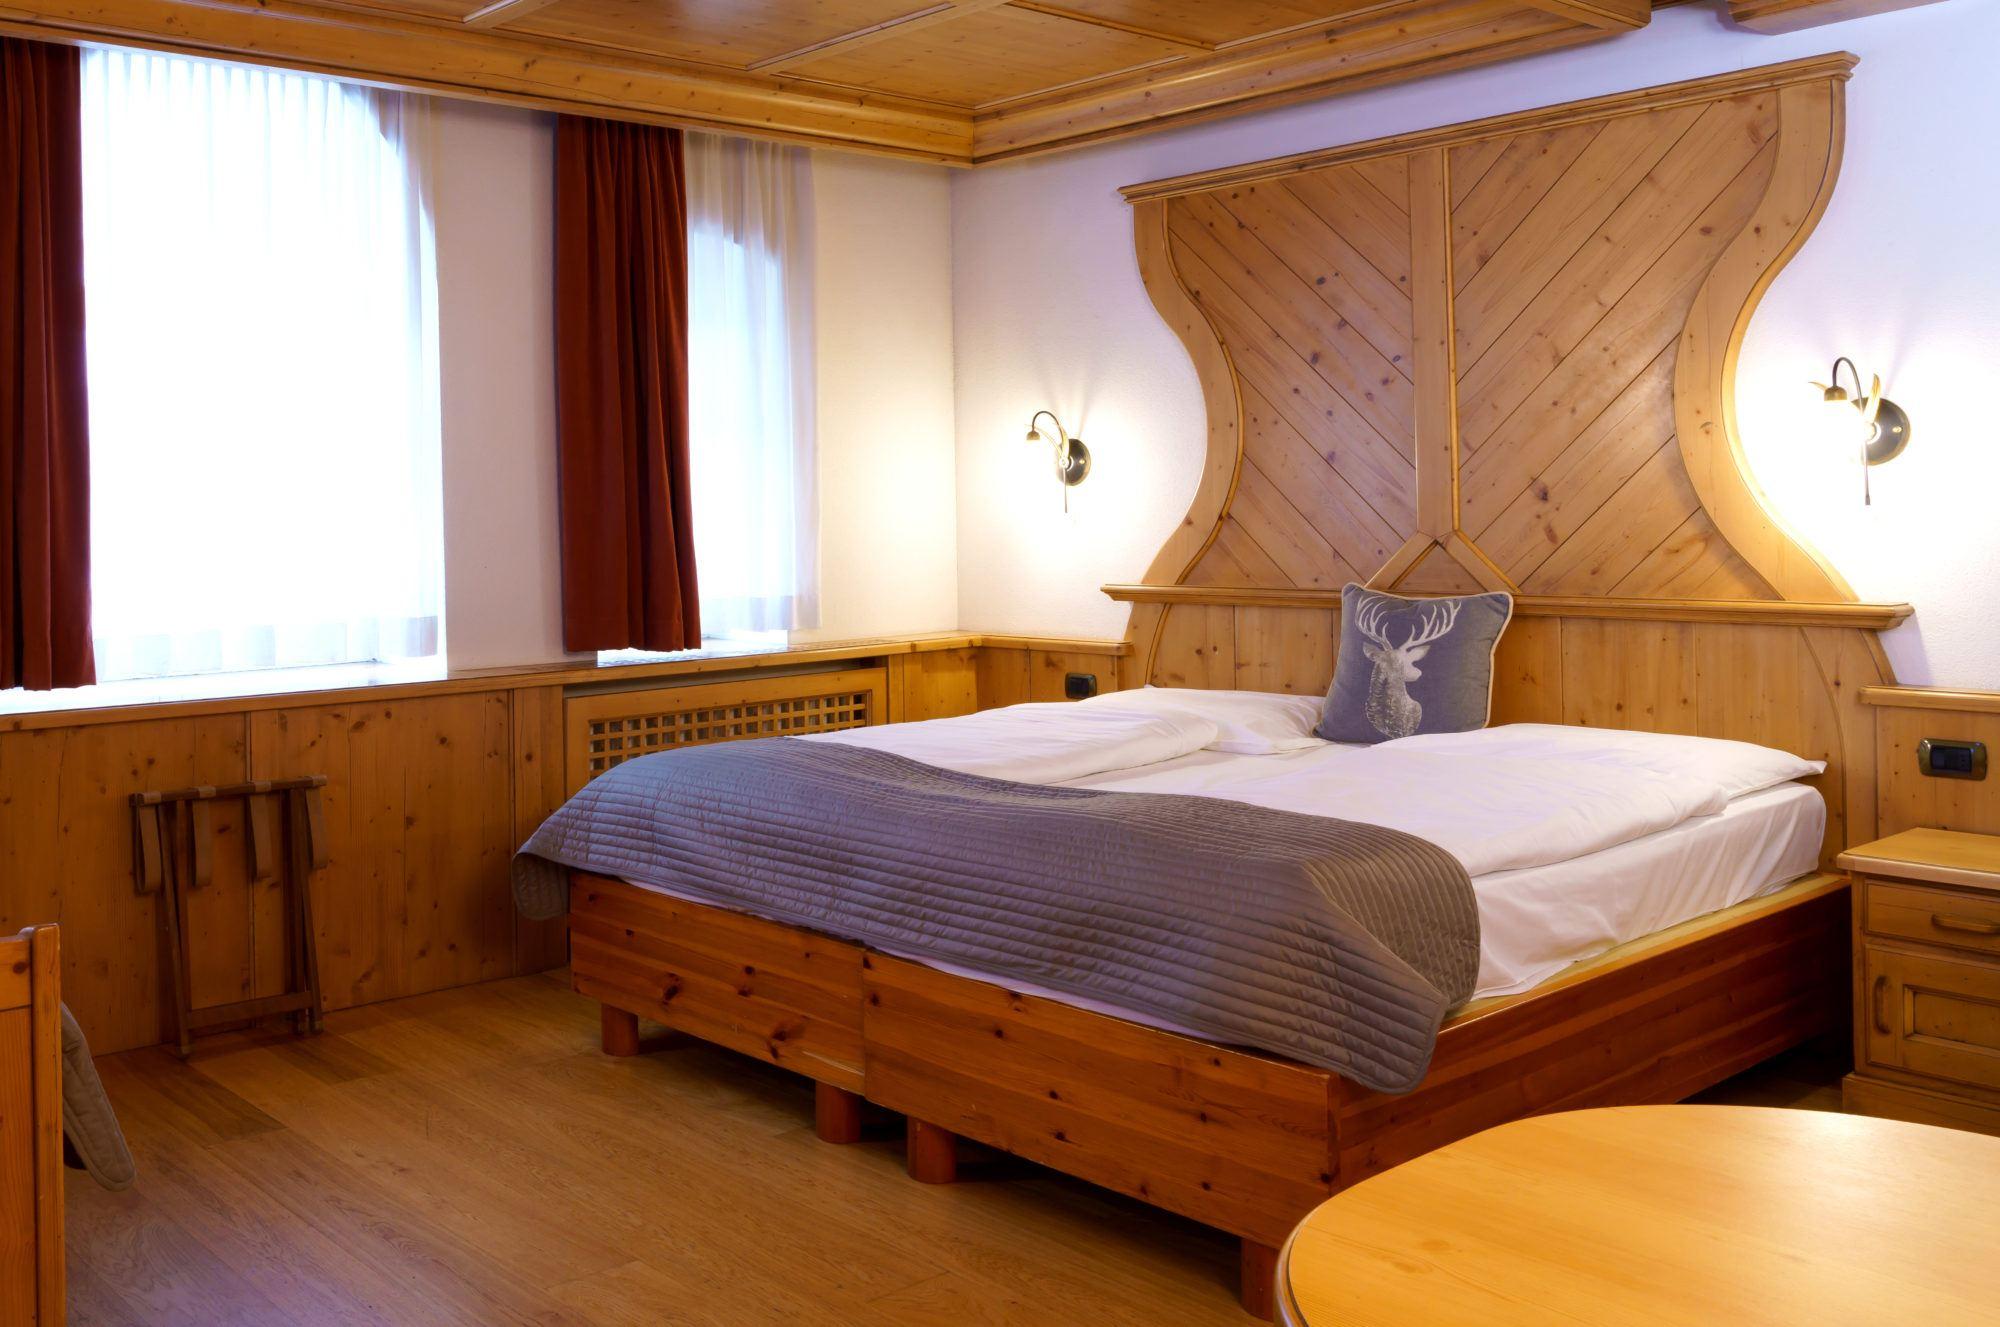 19 Hotel Dolomiti - Room